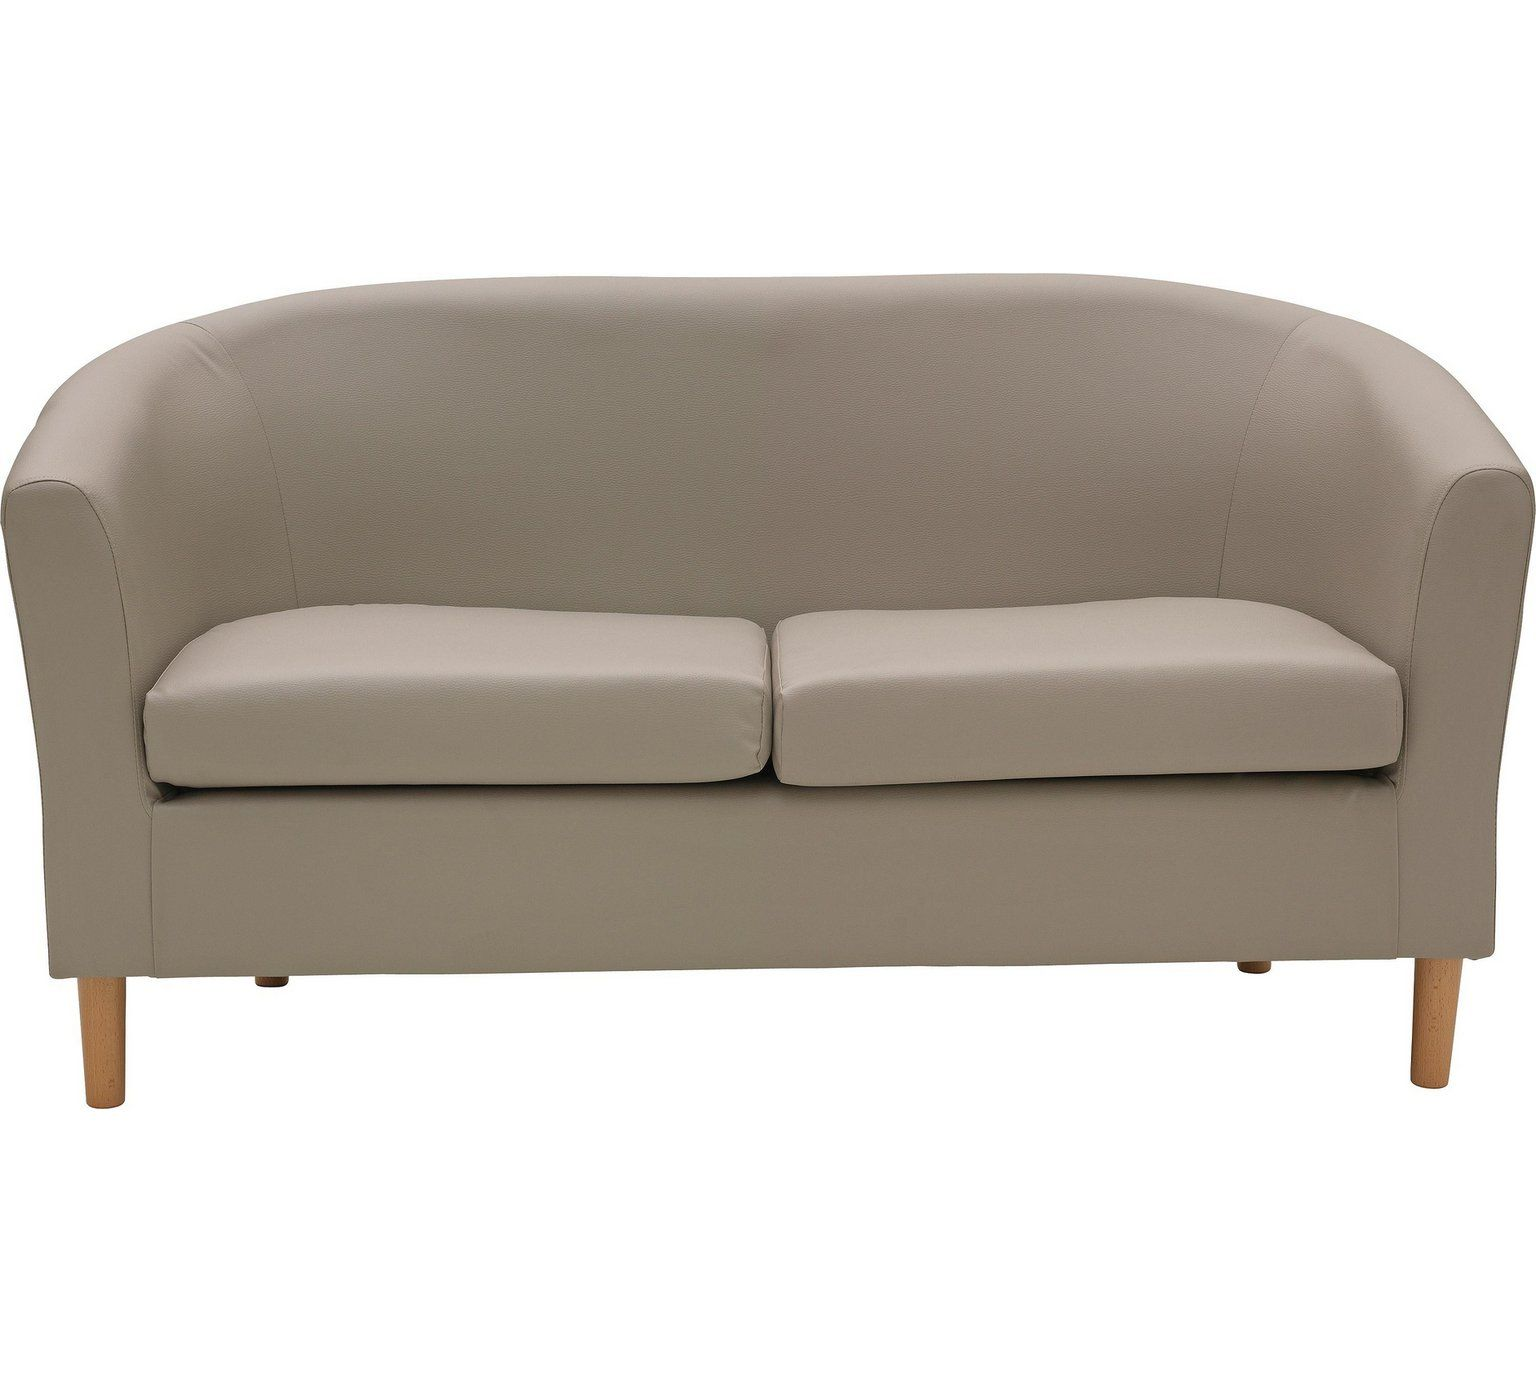 cheap sofas uk argos teak outdoor corner sofa tub and chairs brokeasshome